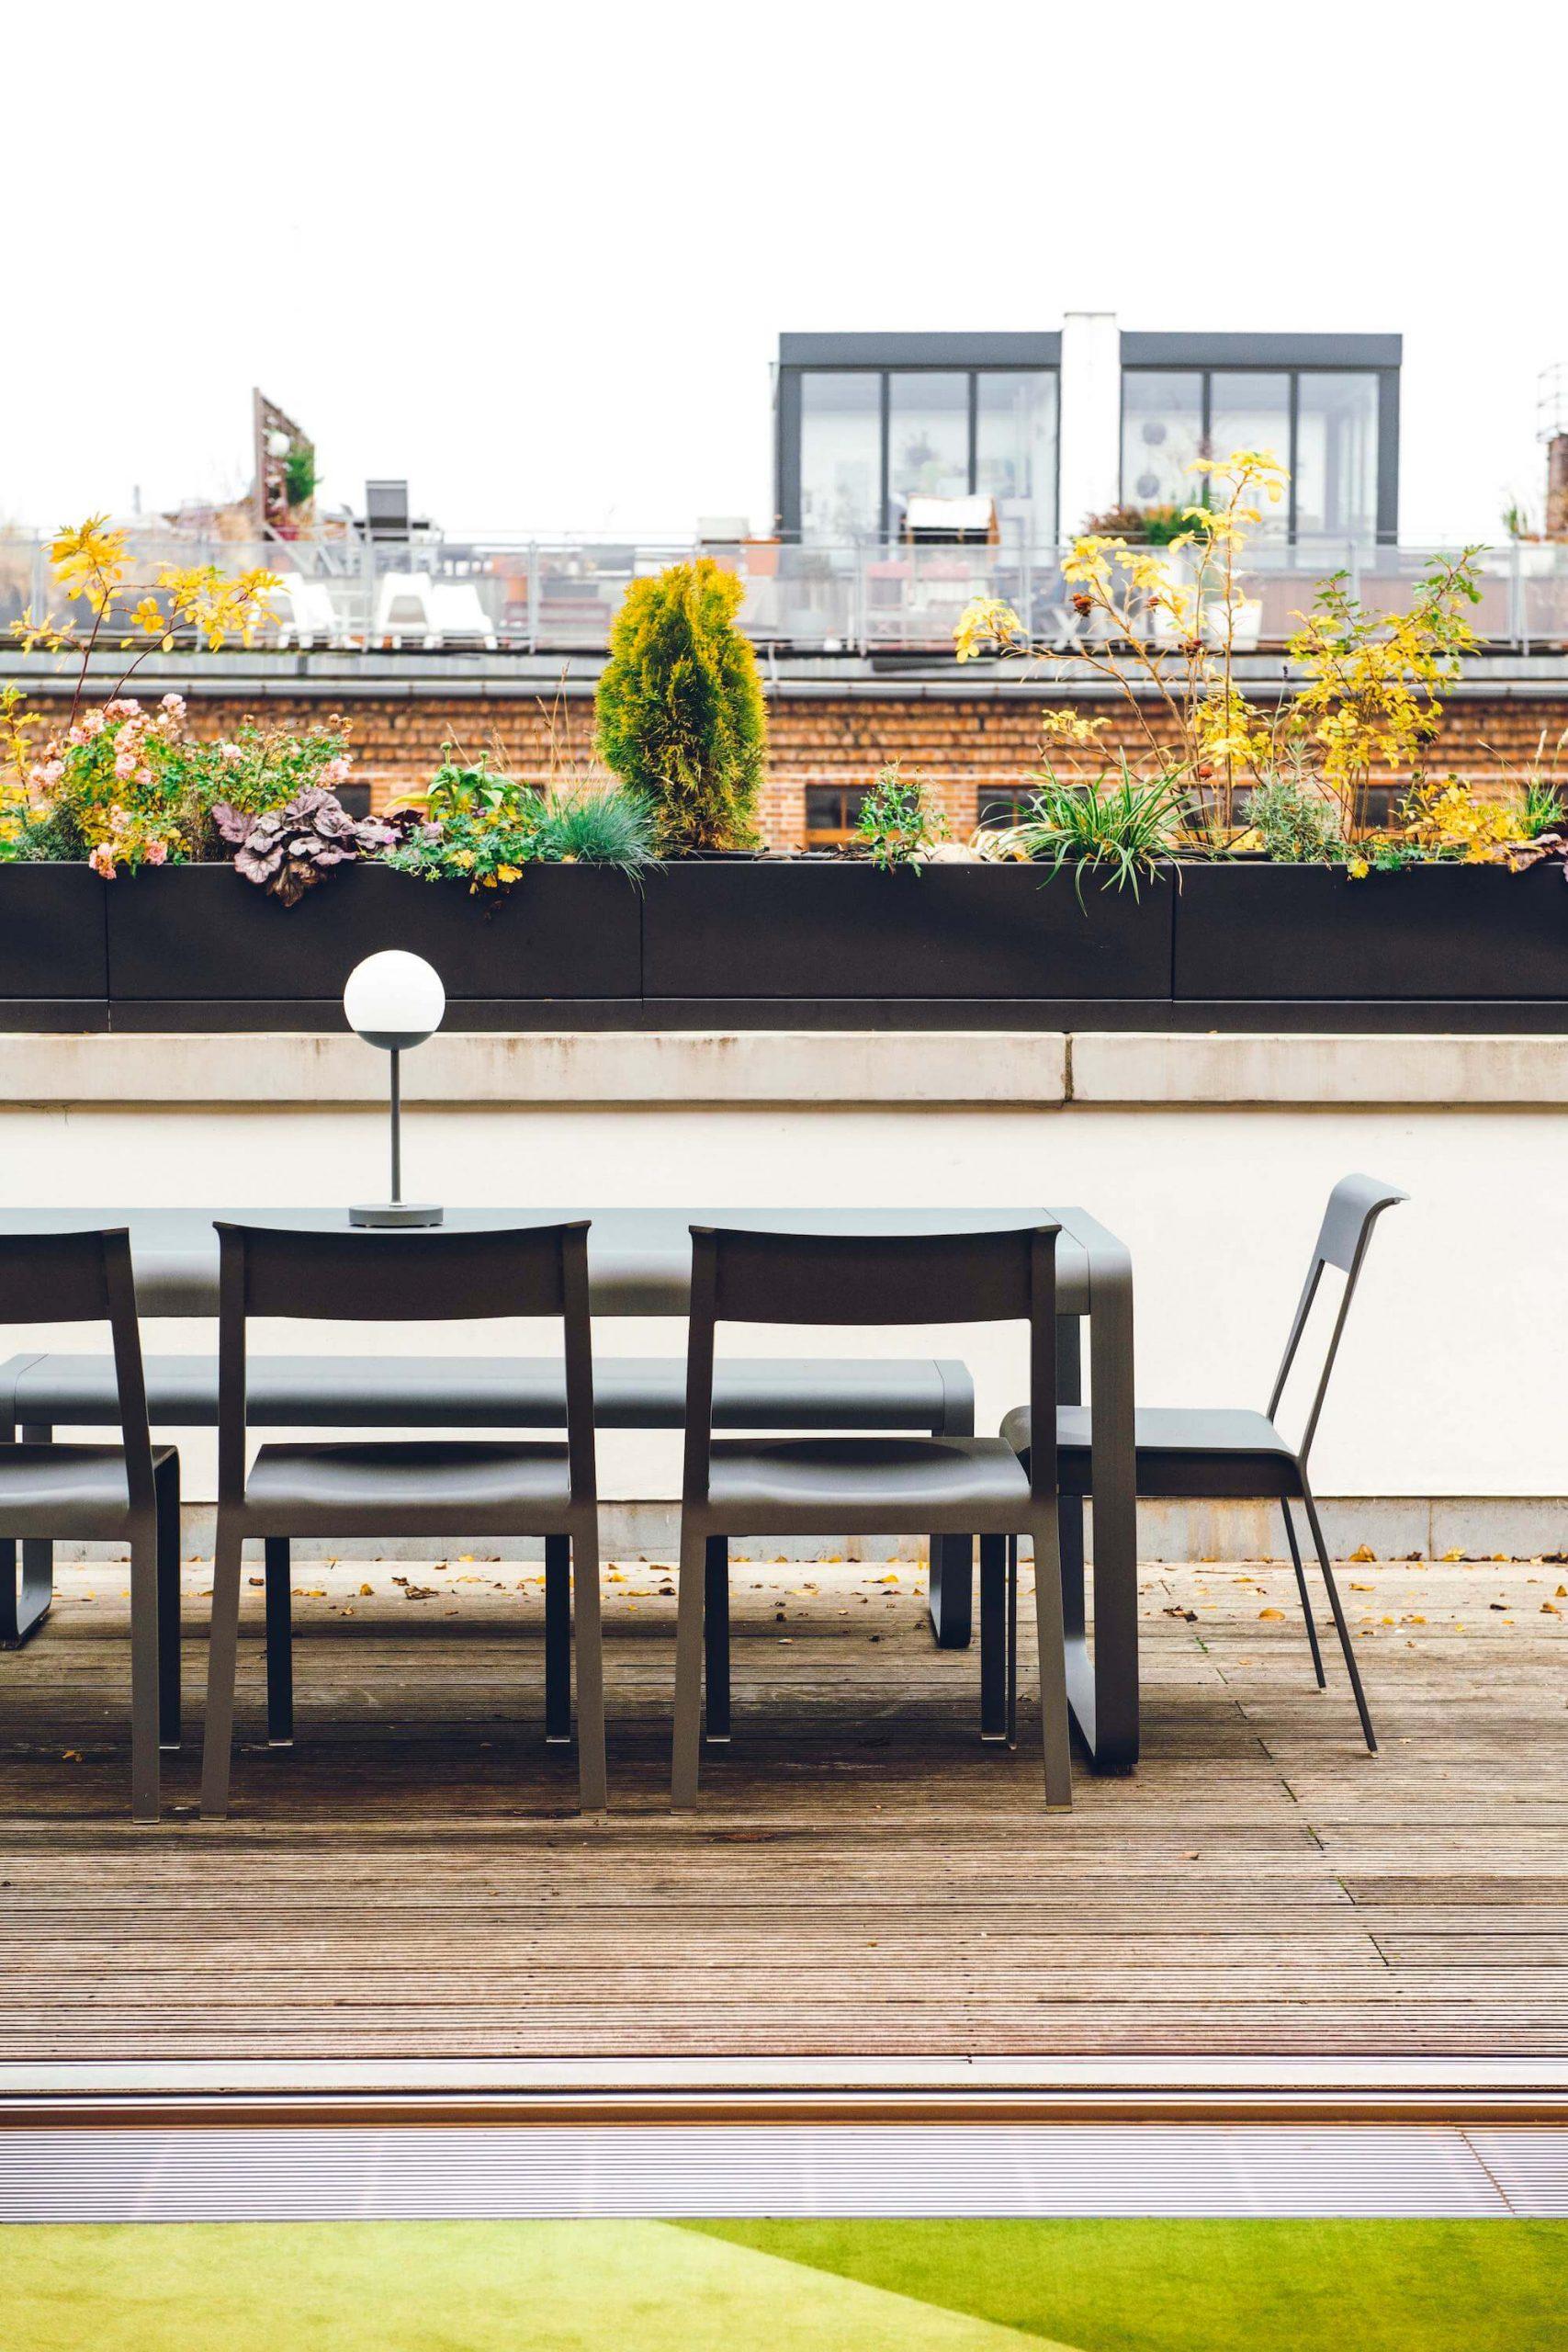 Onefootball Startup Büro TKEZ Architekten Dachterrasse Stühle